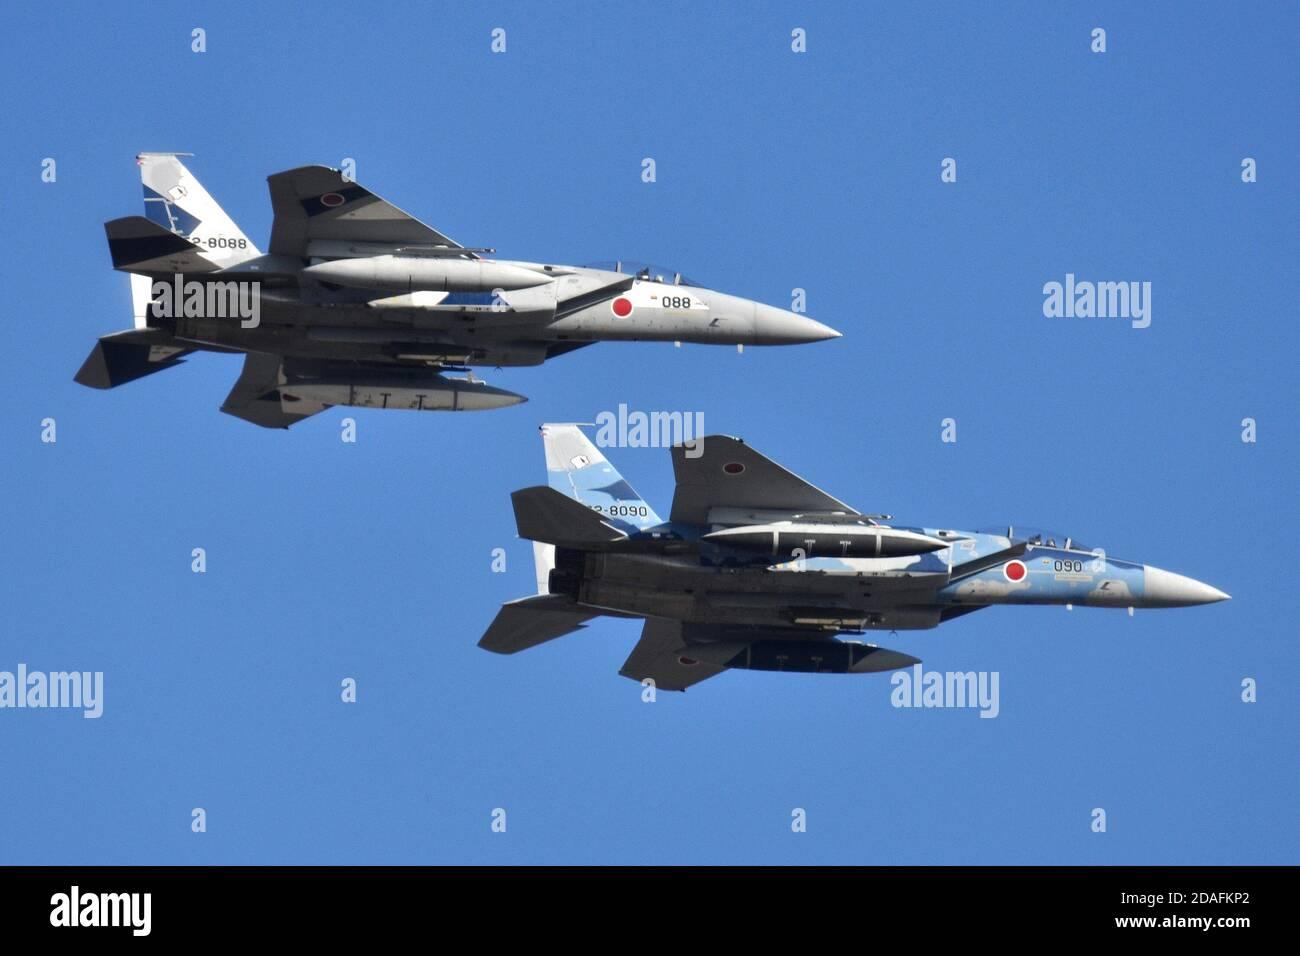 McDONNELL-DOUGLAS F-15DJ EAGLE OF THE JAPANESE AIR SELF-DEFENSE FORCE (JASDF) AGRESSOR SQUADRON.. Stock Photo